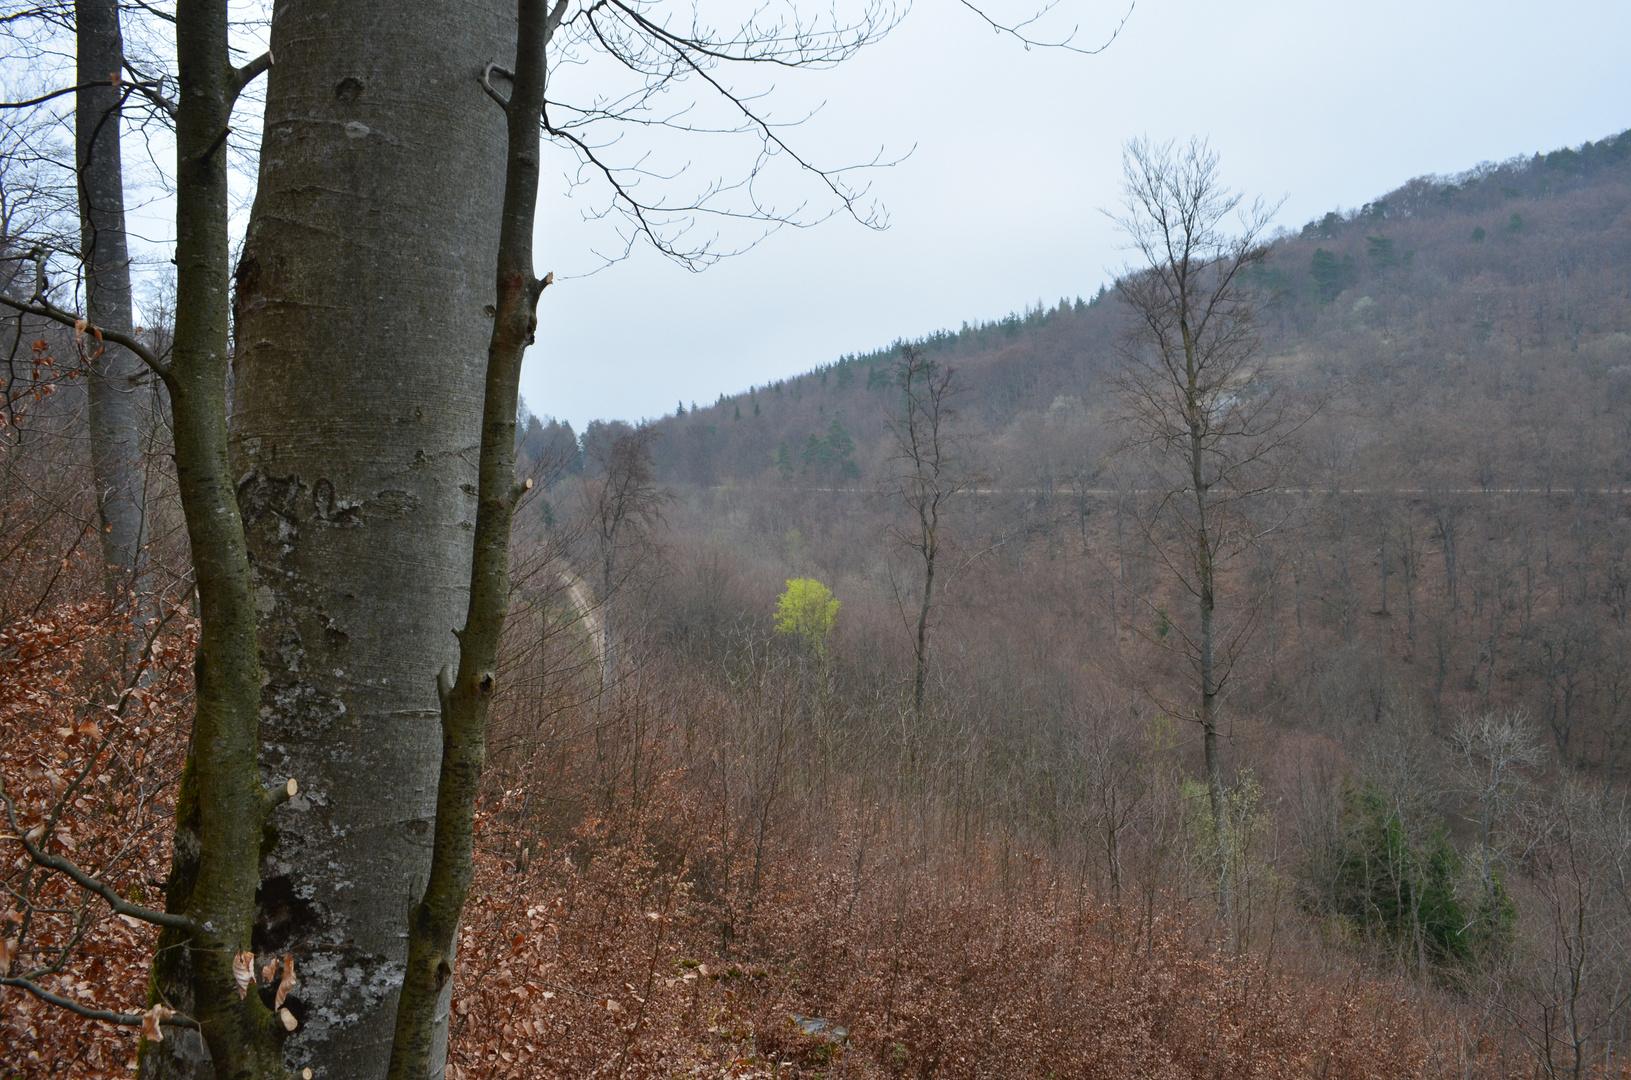 Ein Farbfleck im kahlen Wald